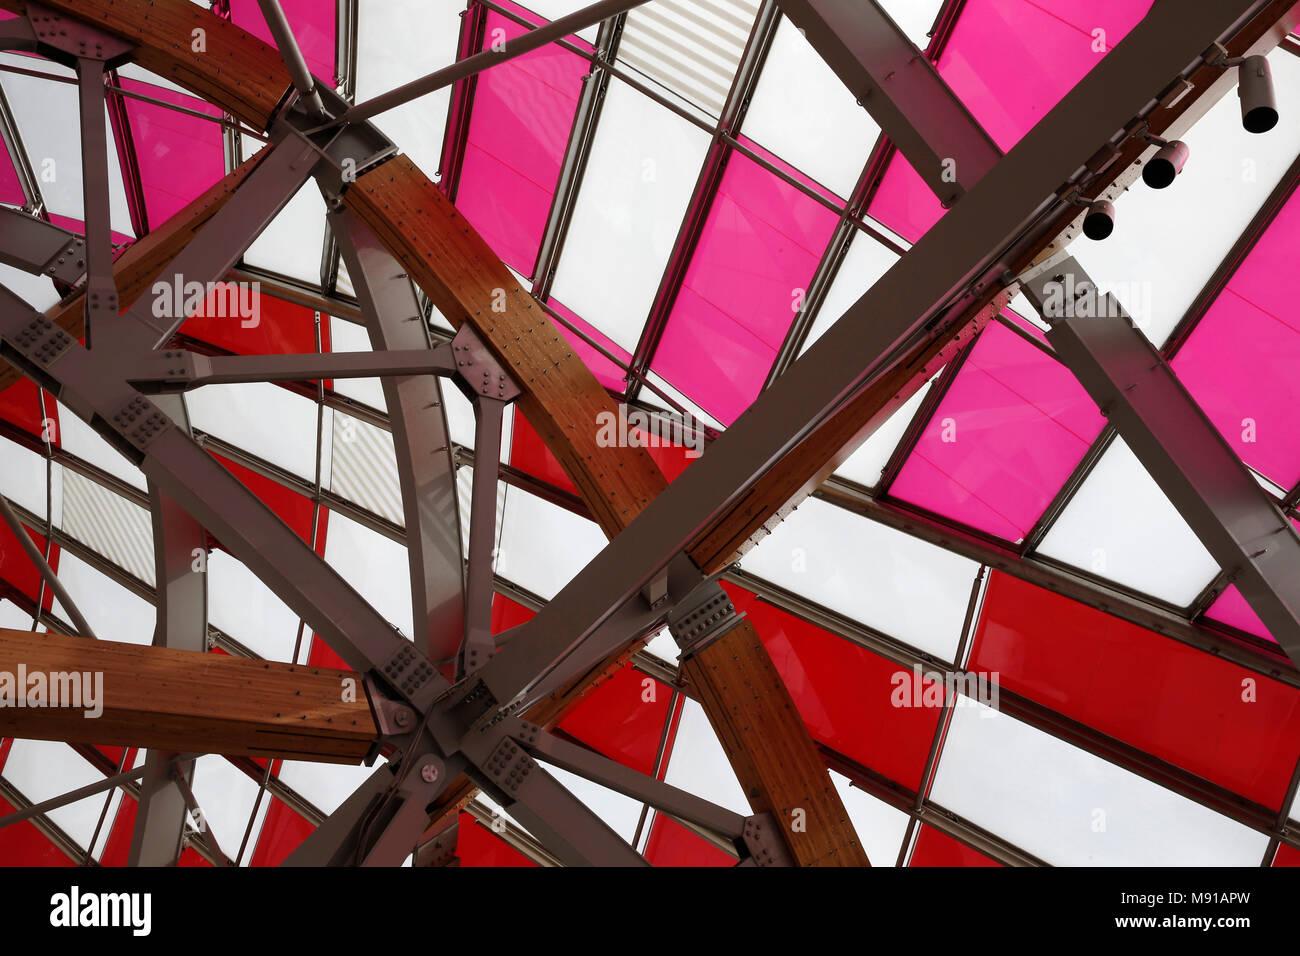 Vuitton foundation roof, Paris, France. - Stock Image